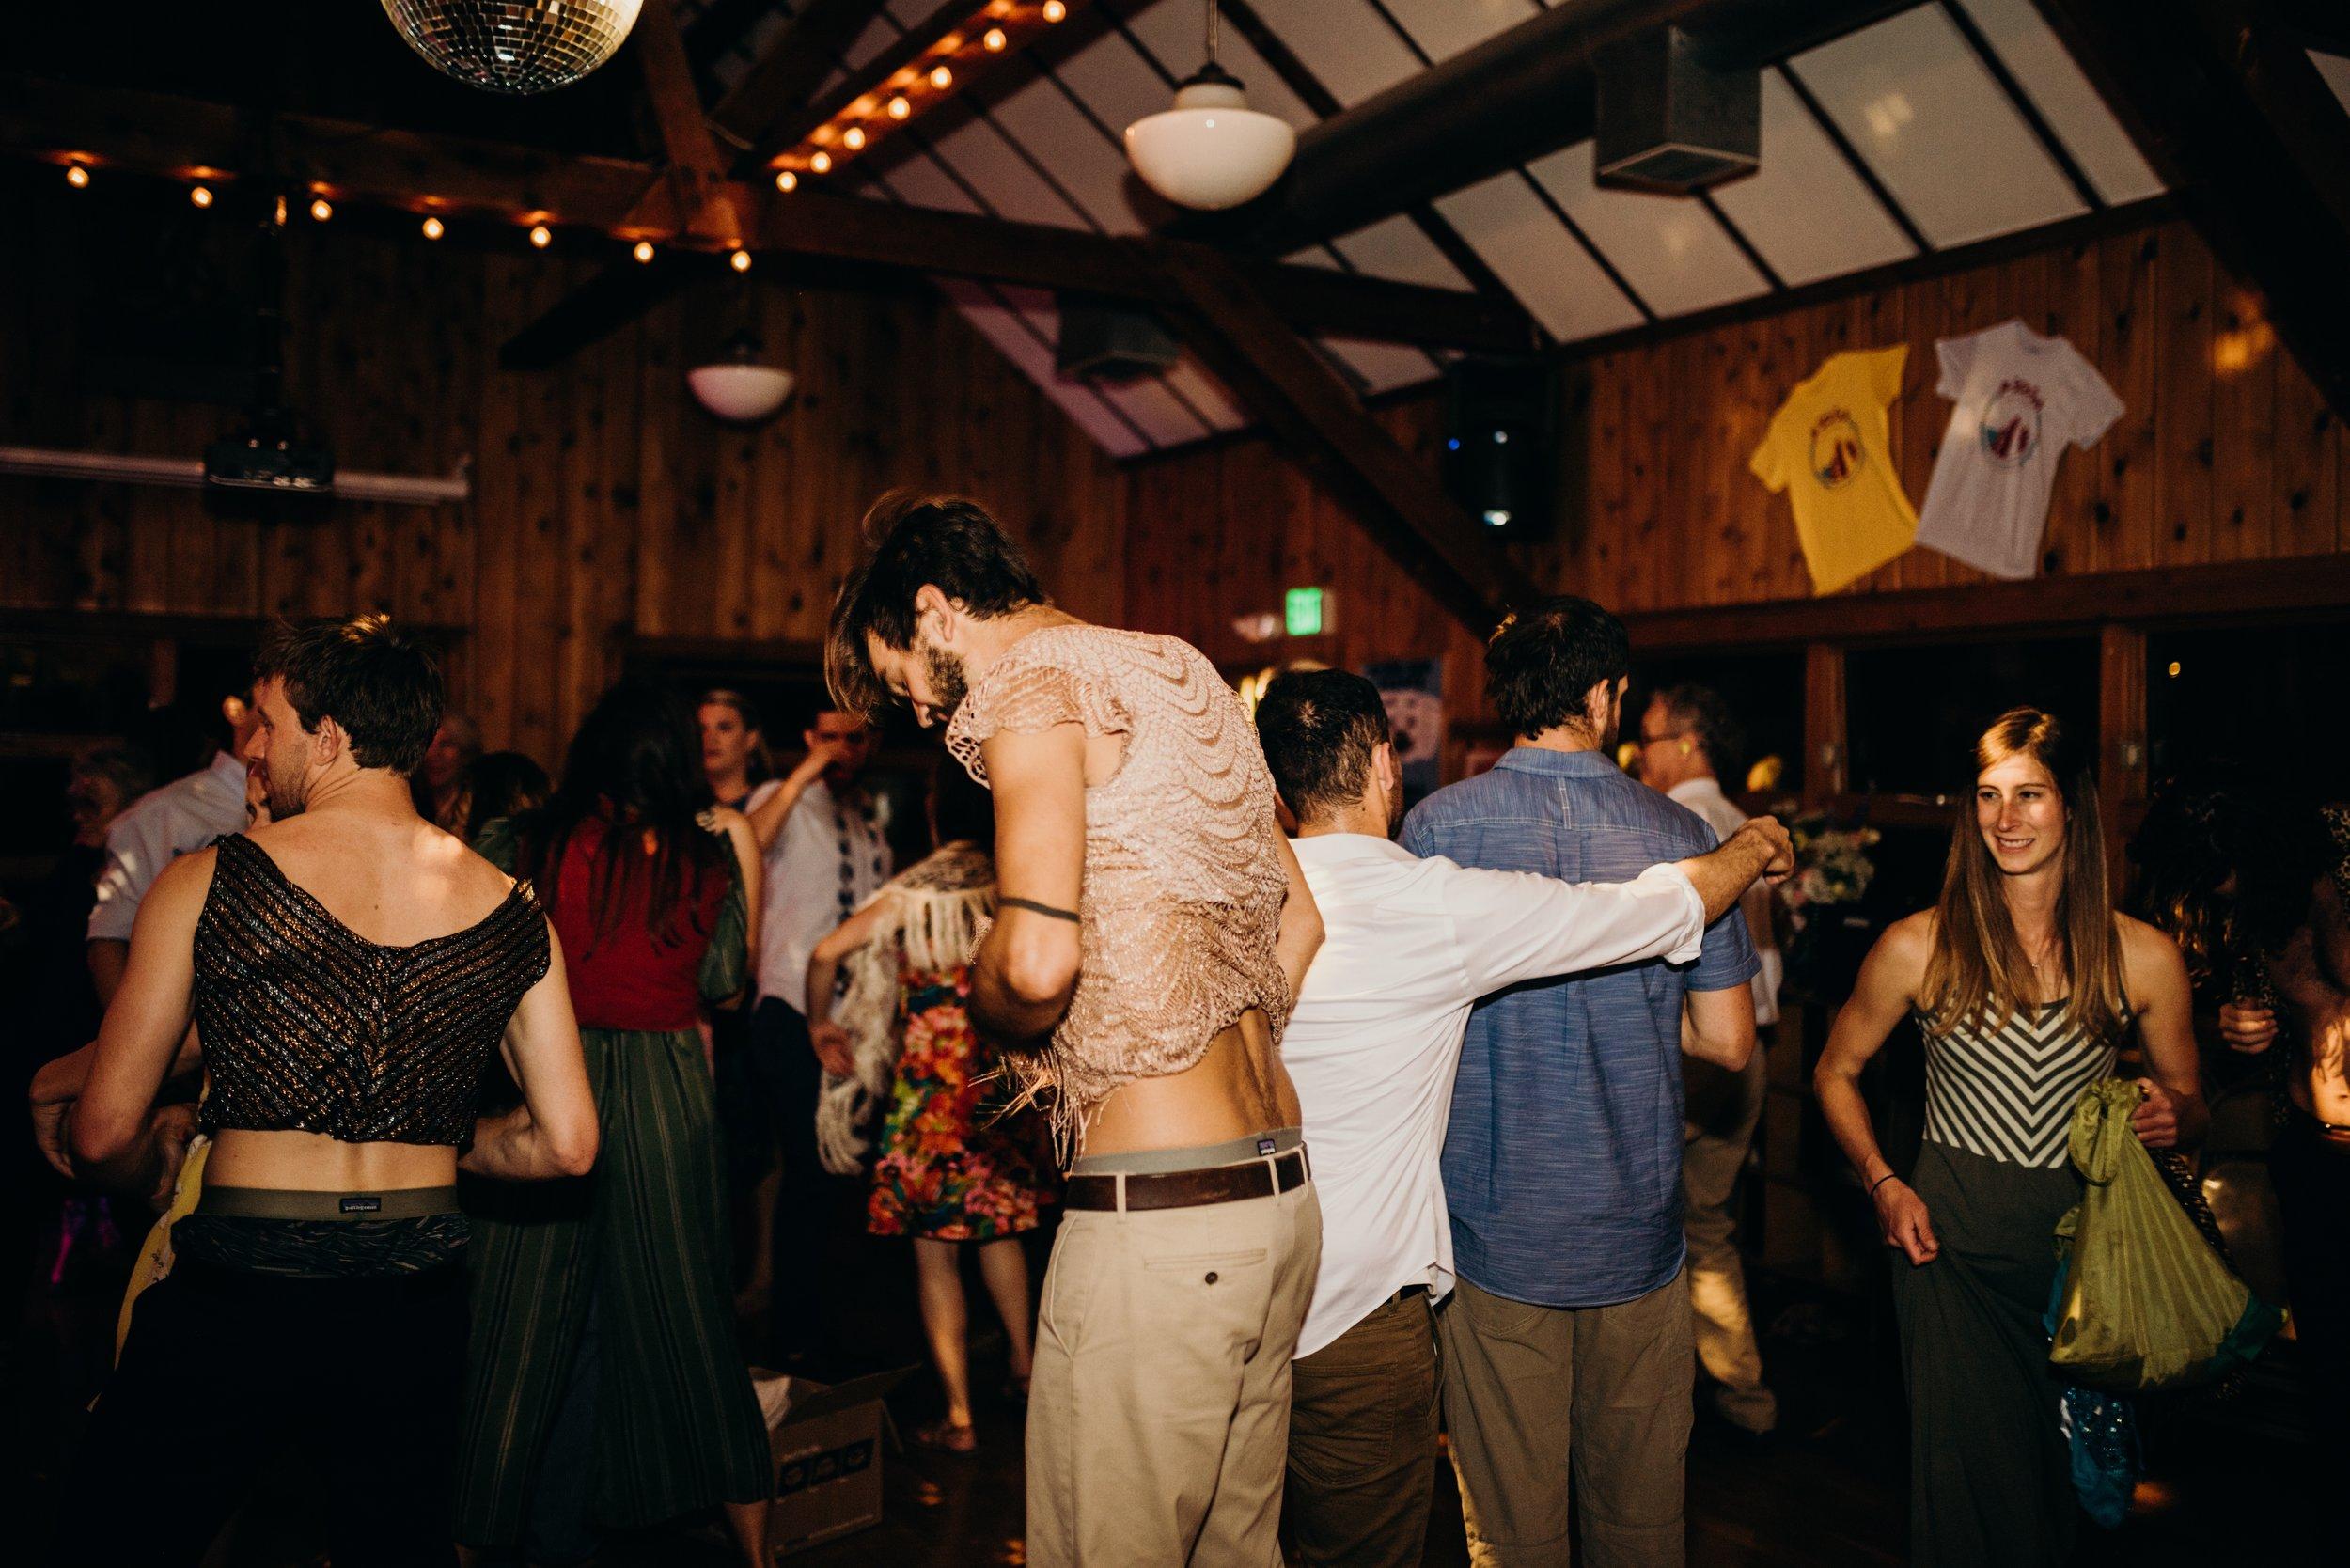 10 Dancing-36.jpeg